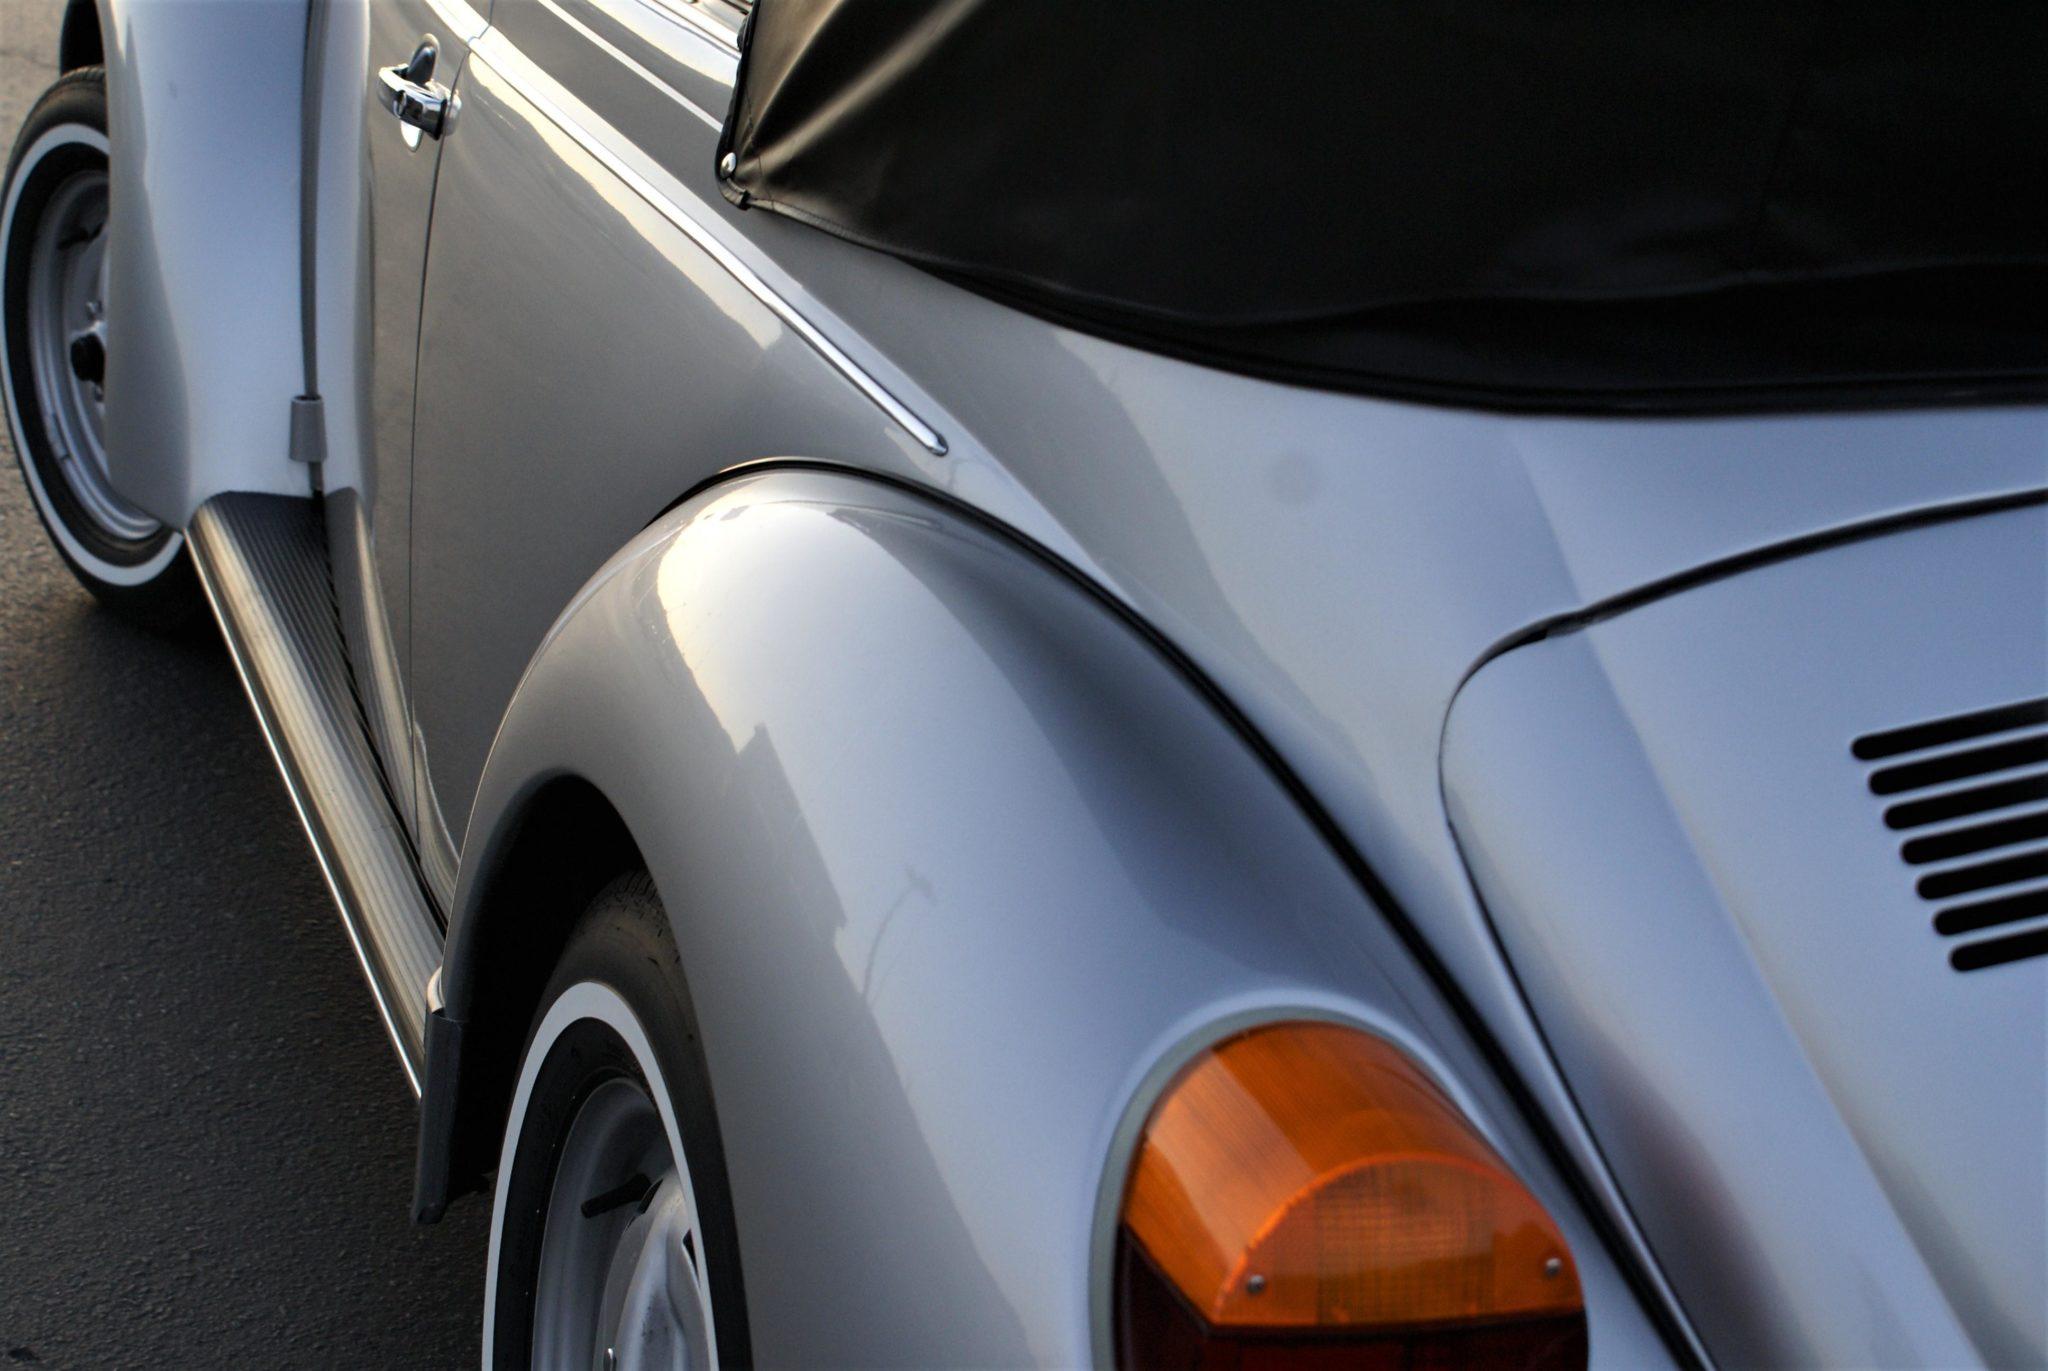 1979_volkswagen_super_beetle_cabriolet_15870735565edb25977DSC07381-scaled